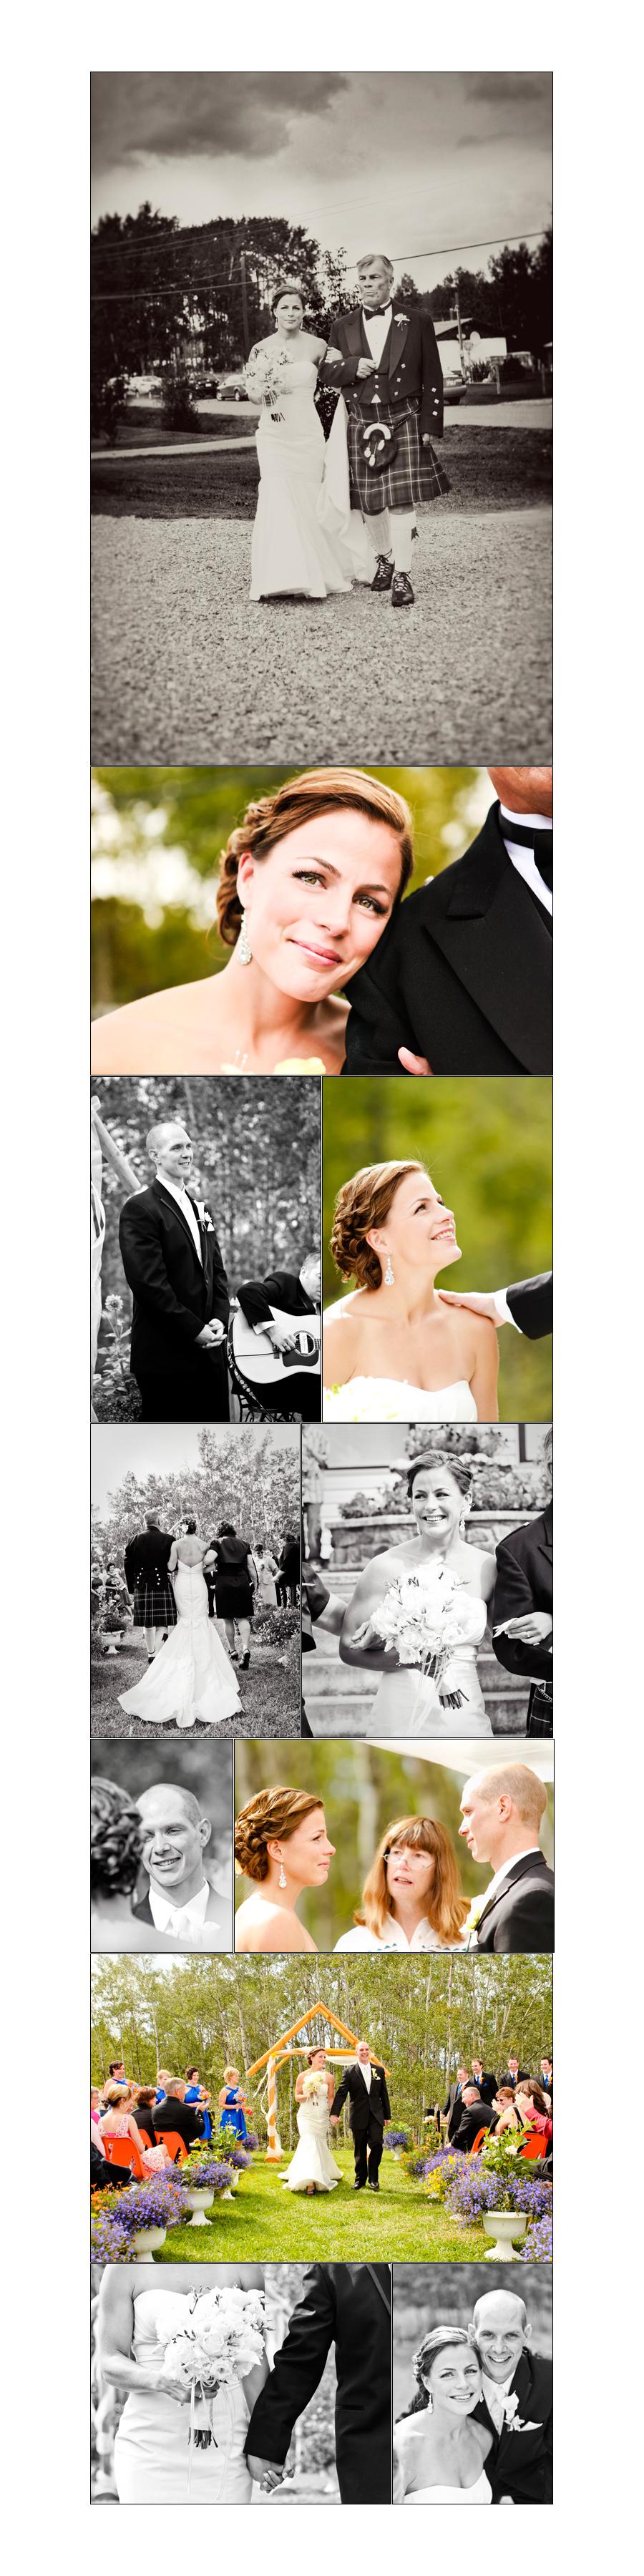 blog4-wedding